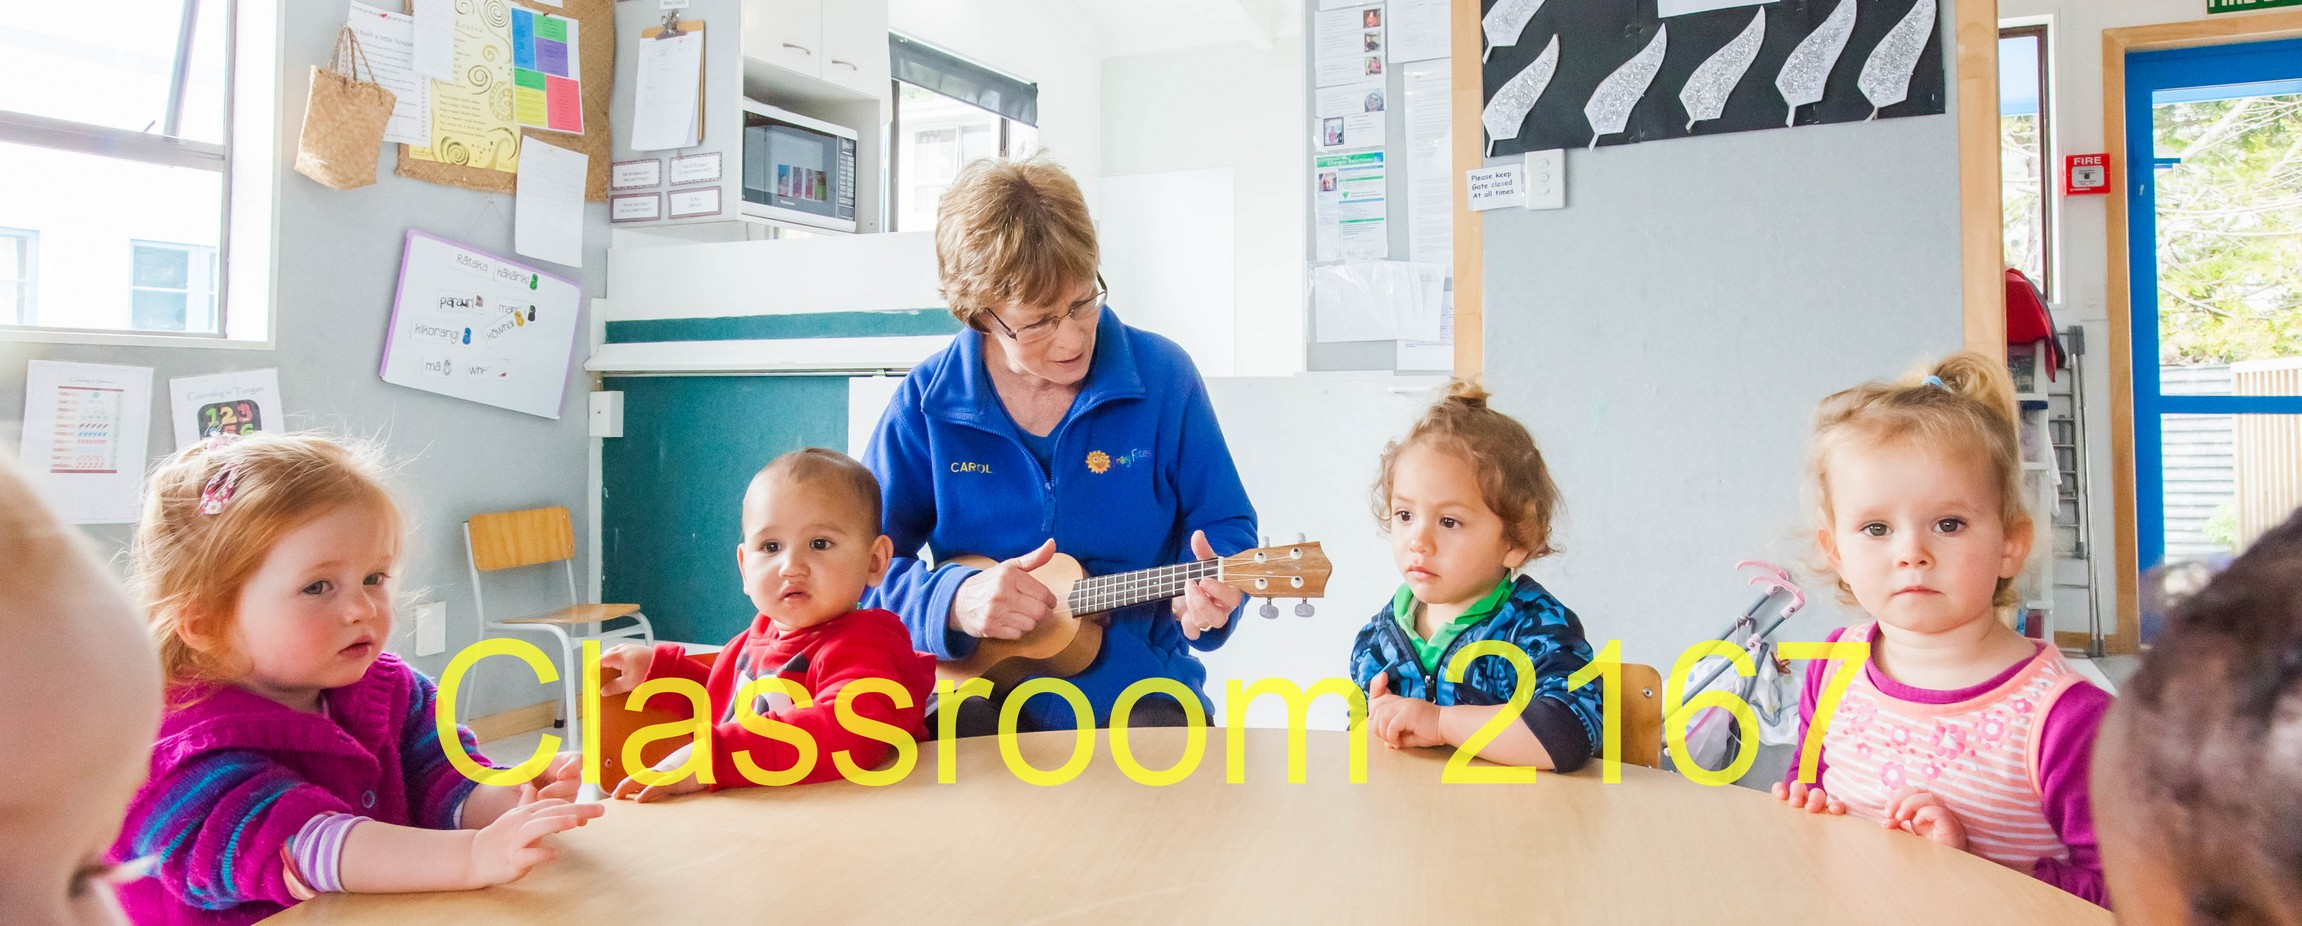 Classroom 2167